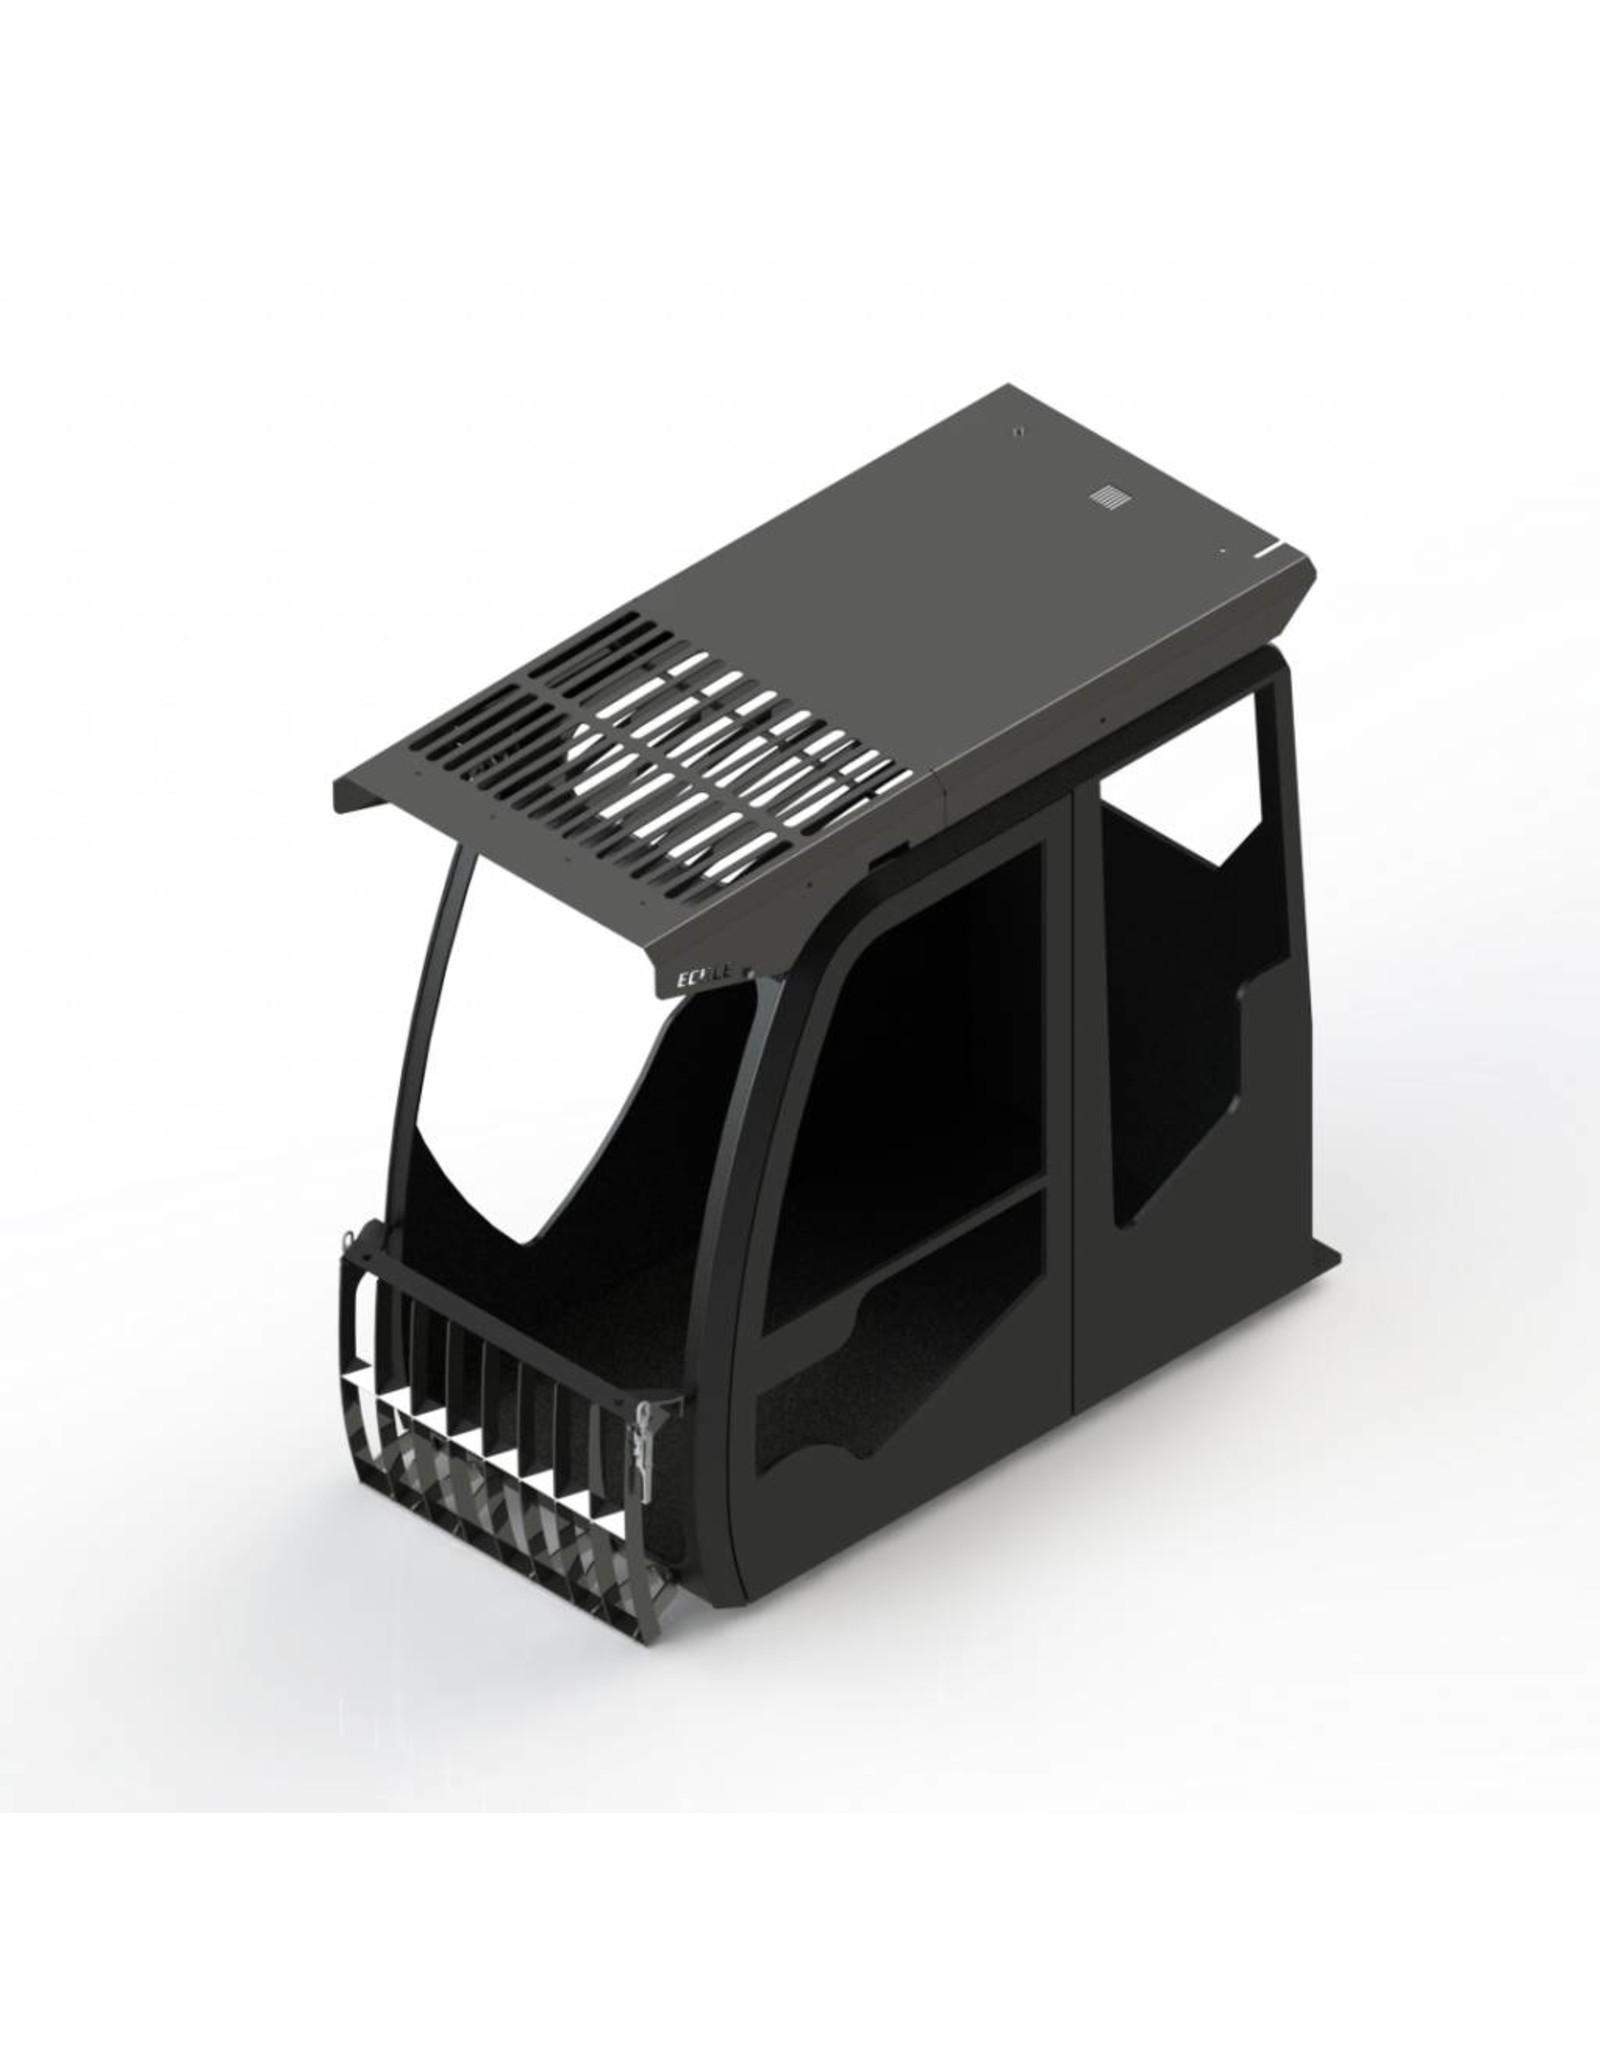 Echle Hartstahl GmbH FOPS für Sany SY335C